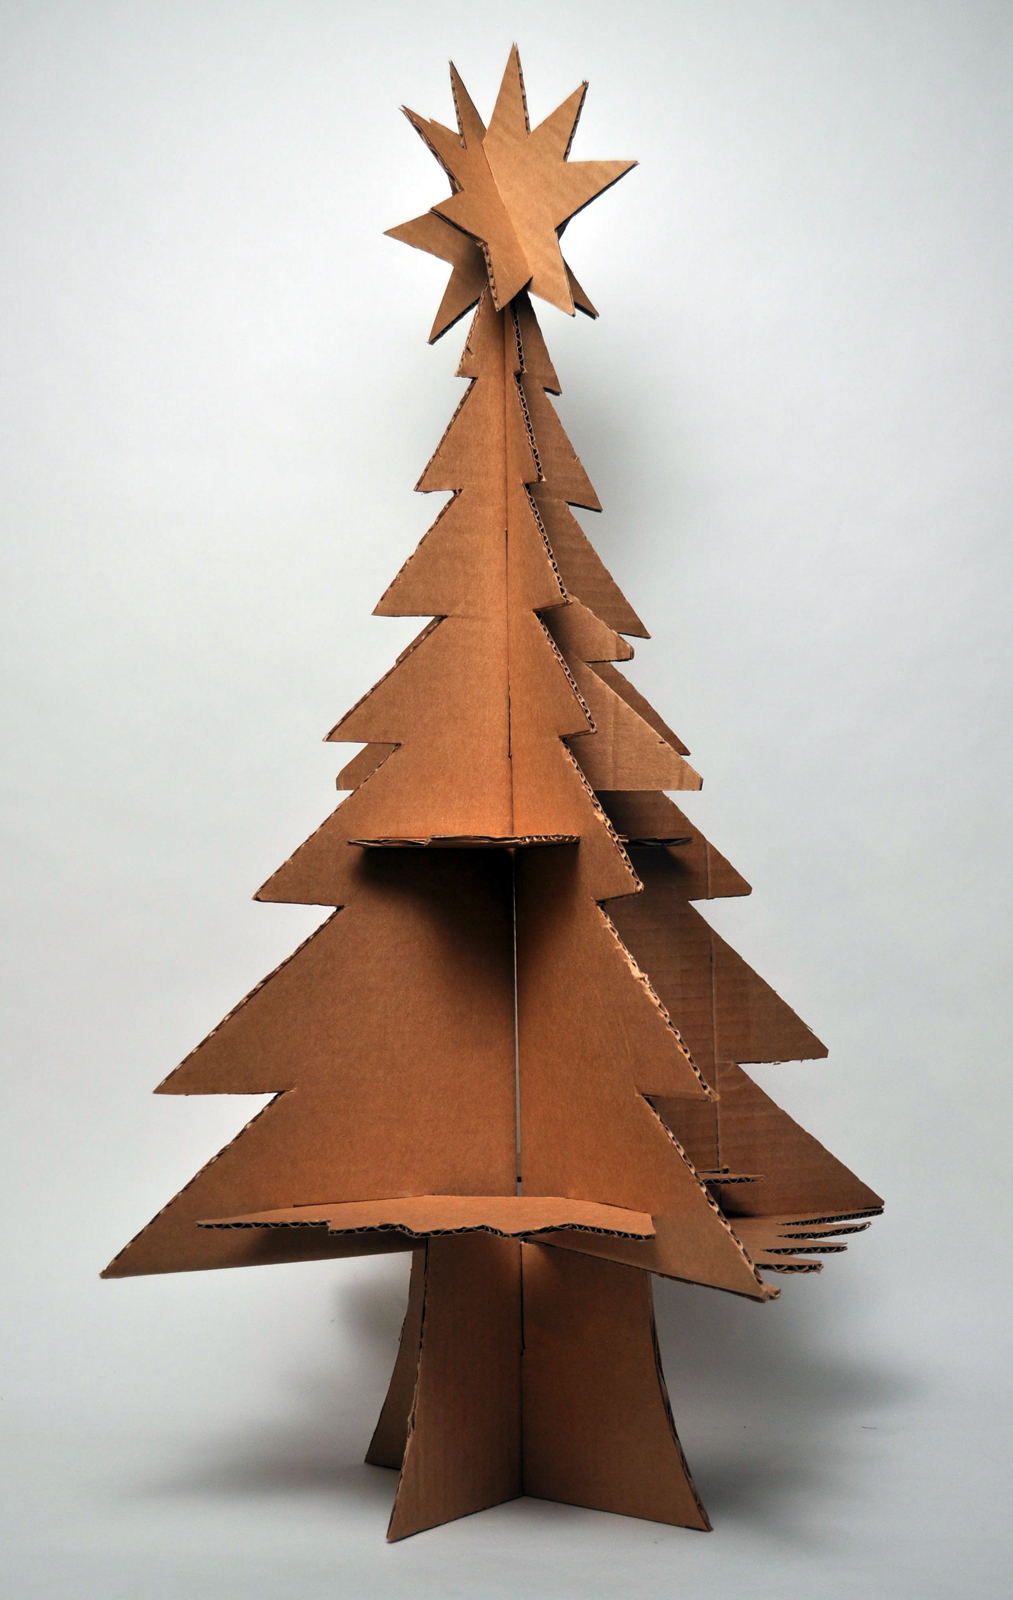 Hutch studio a cardboard christmas - Sapin de noel carton ...